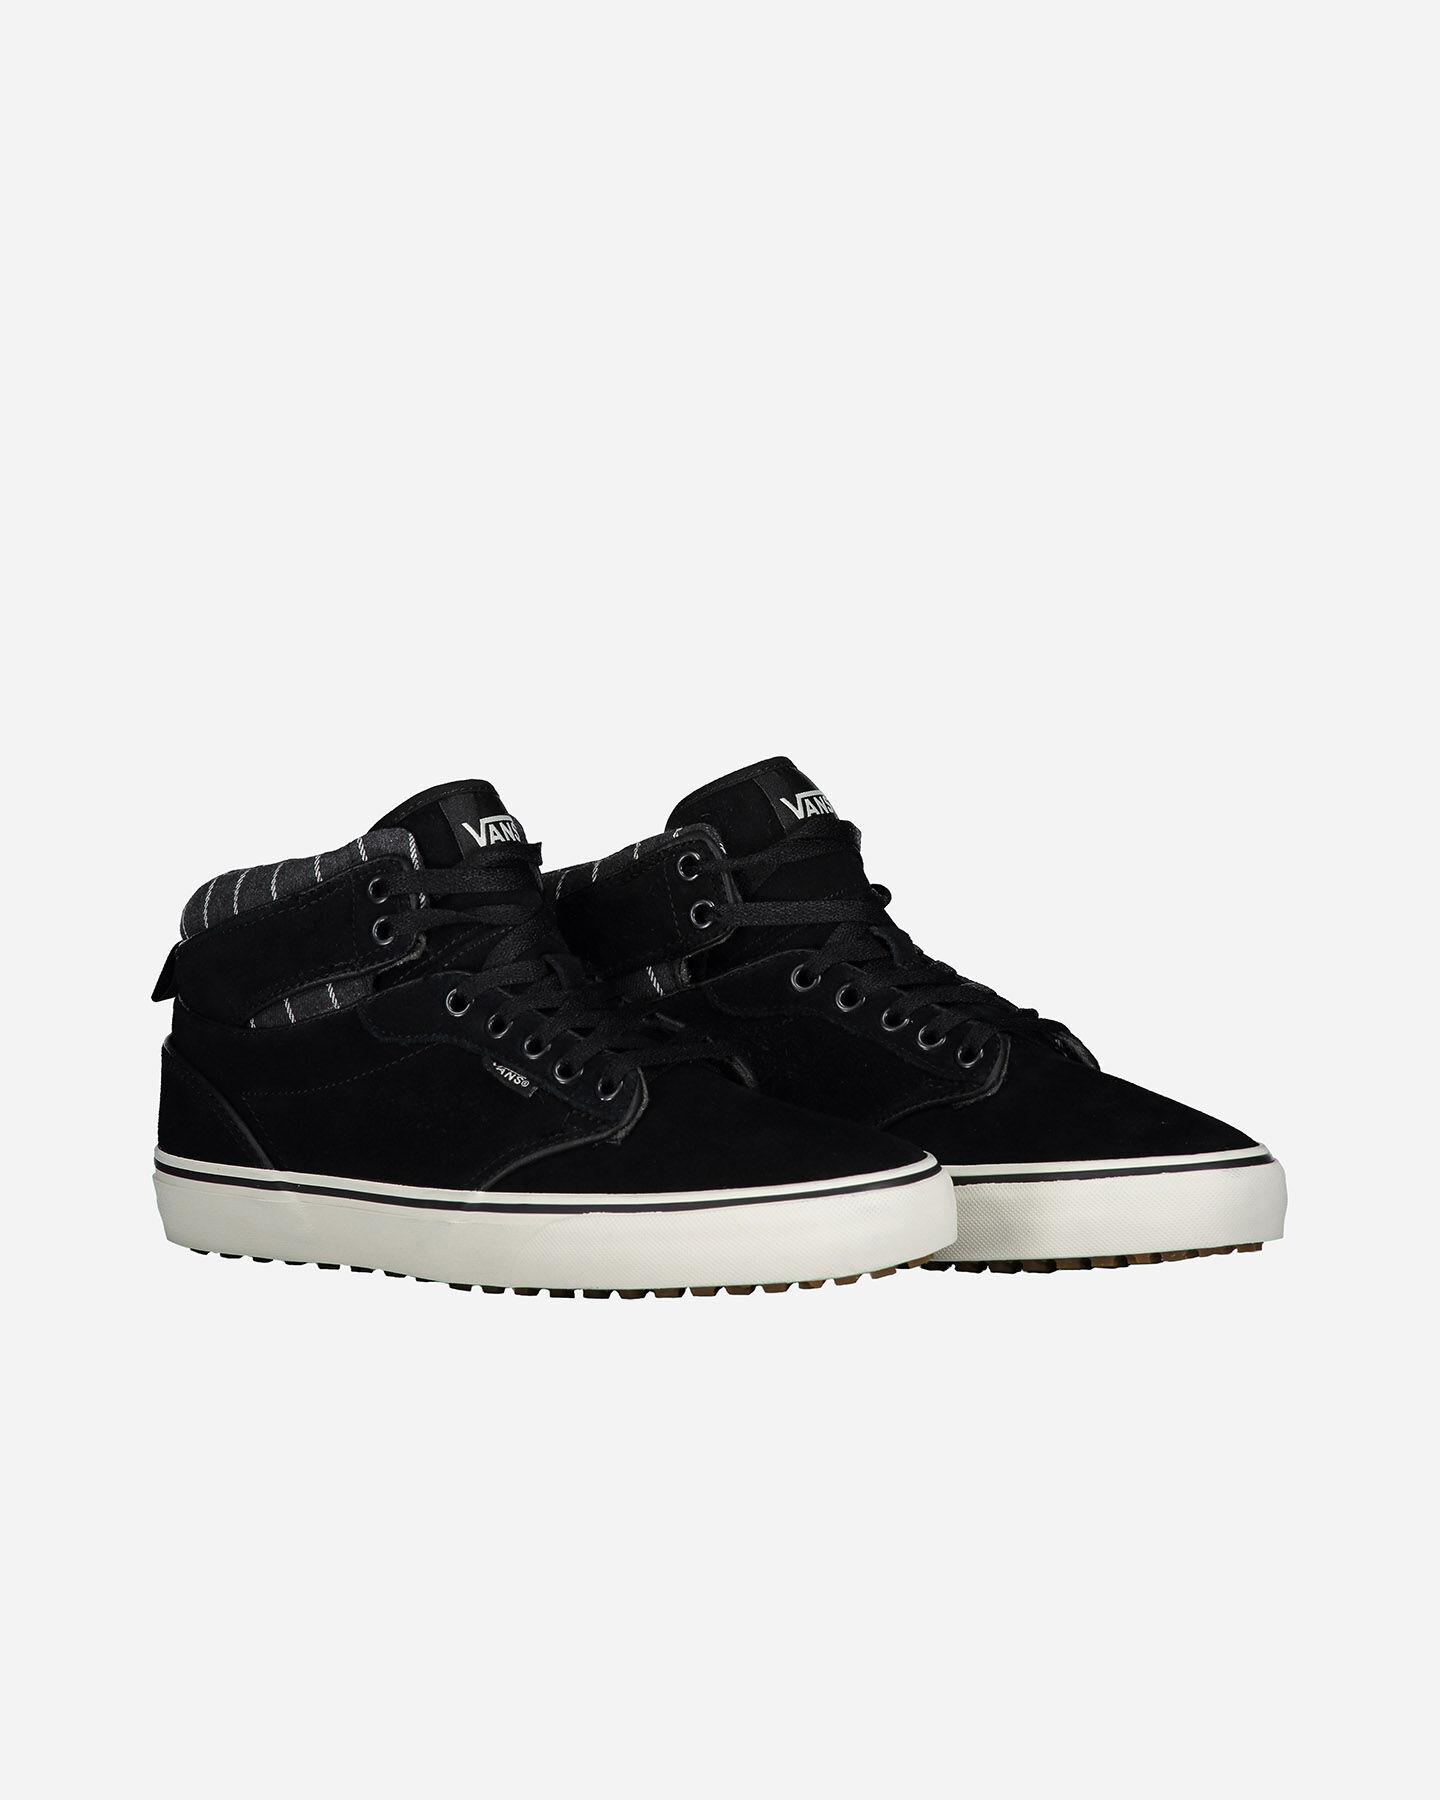 Cisalfa Su Vans Scarpe Hi Sport Va2xsvi28 Mte M Atwood Sneakers xq0Bwq68H 7c3ee44a499